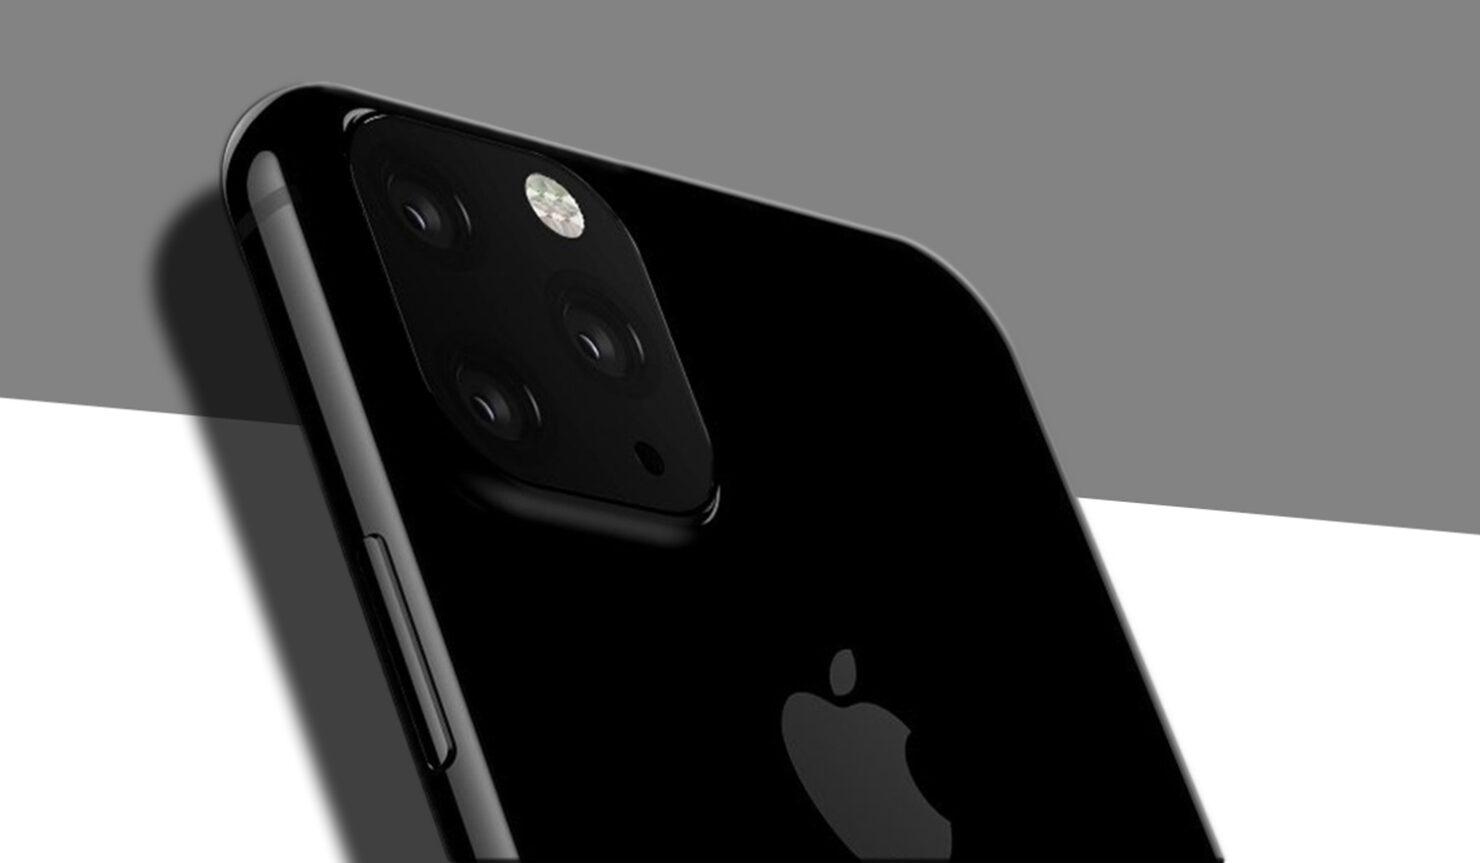 iPhone 5G models